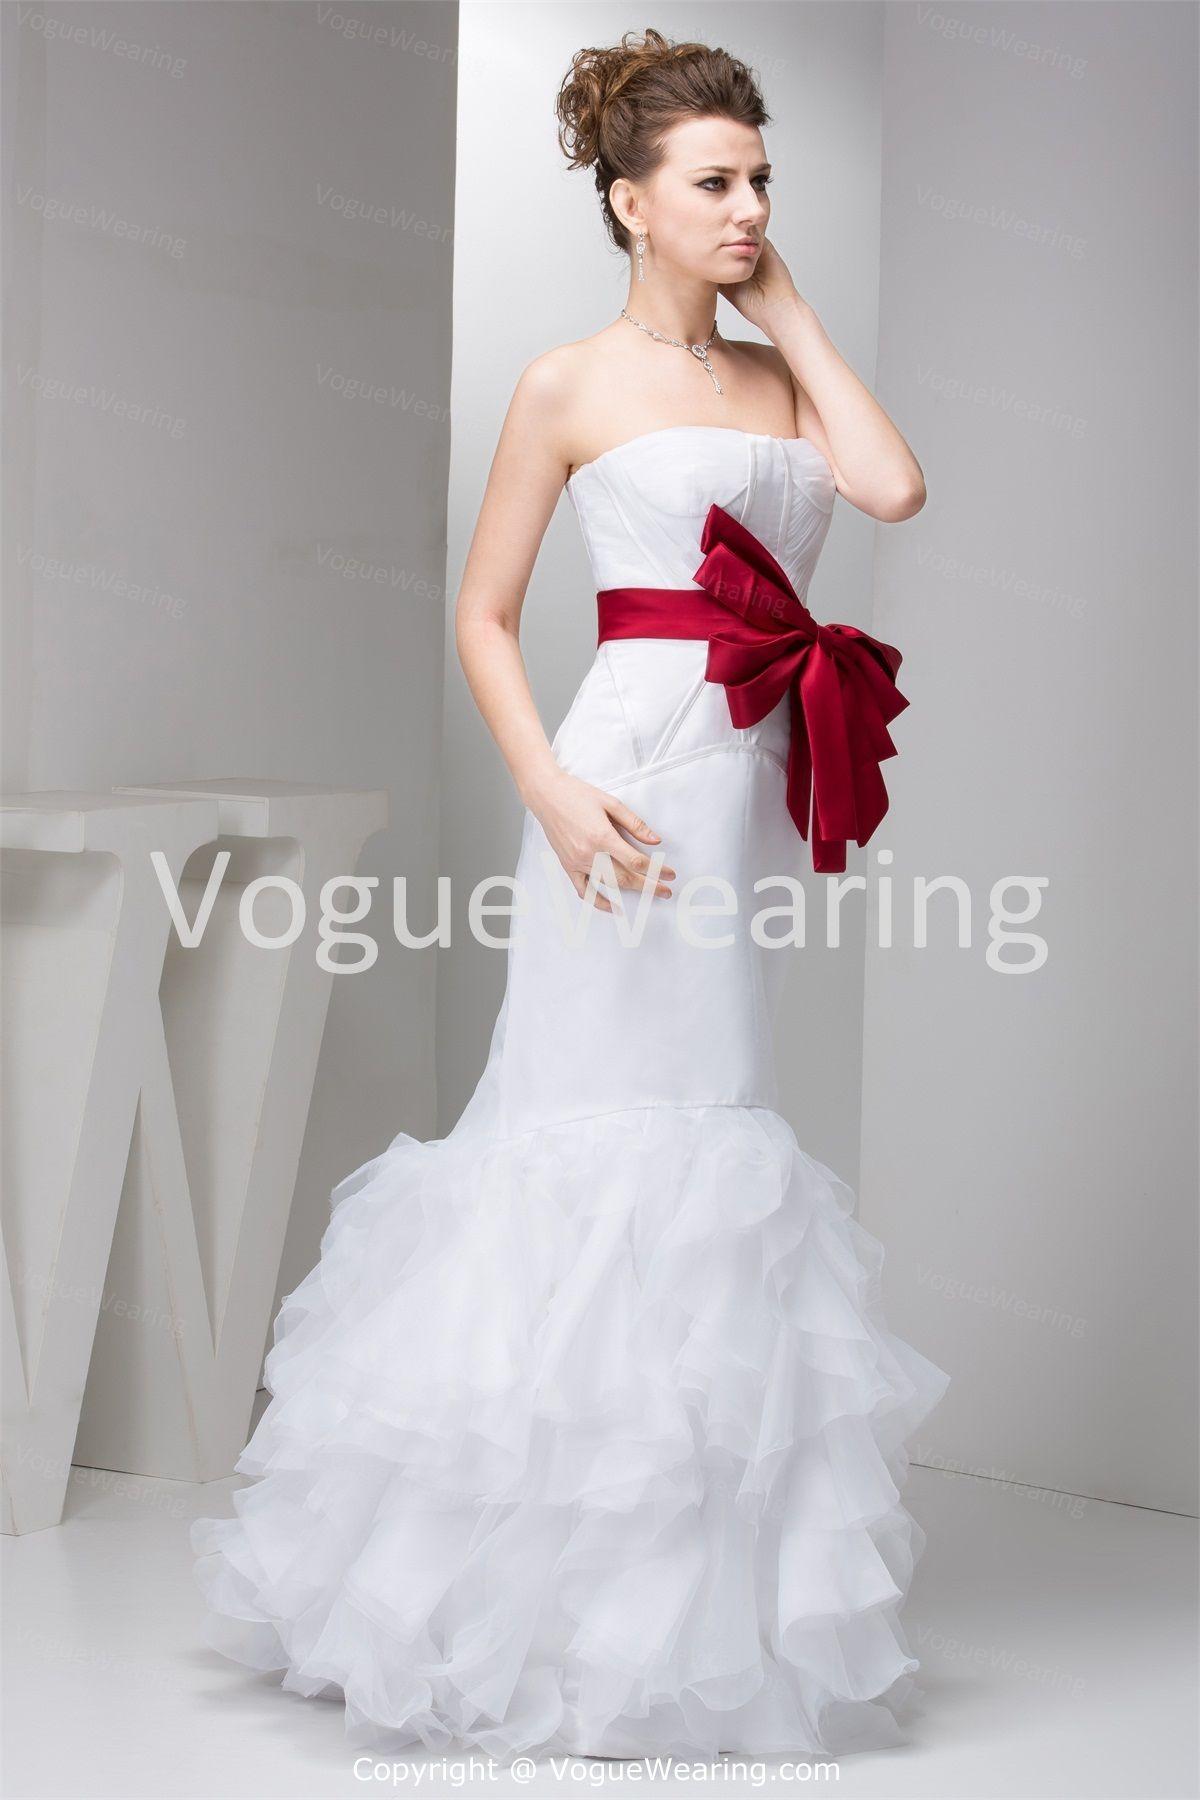 Mermaid Wedding Gown Red White Wedding Dress Wedding Gowns Mermaid Drop Waist Wedding Dress [ 1800 x 1200 Pixel ]